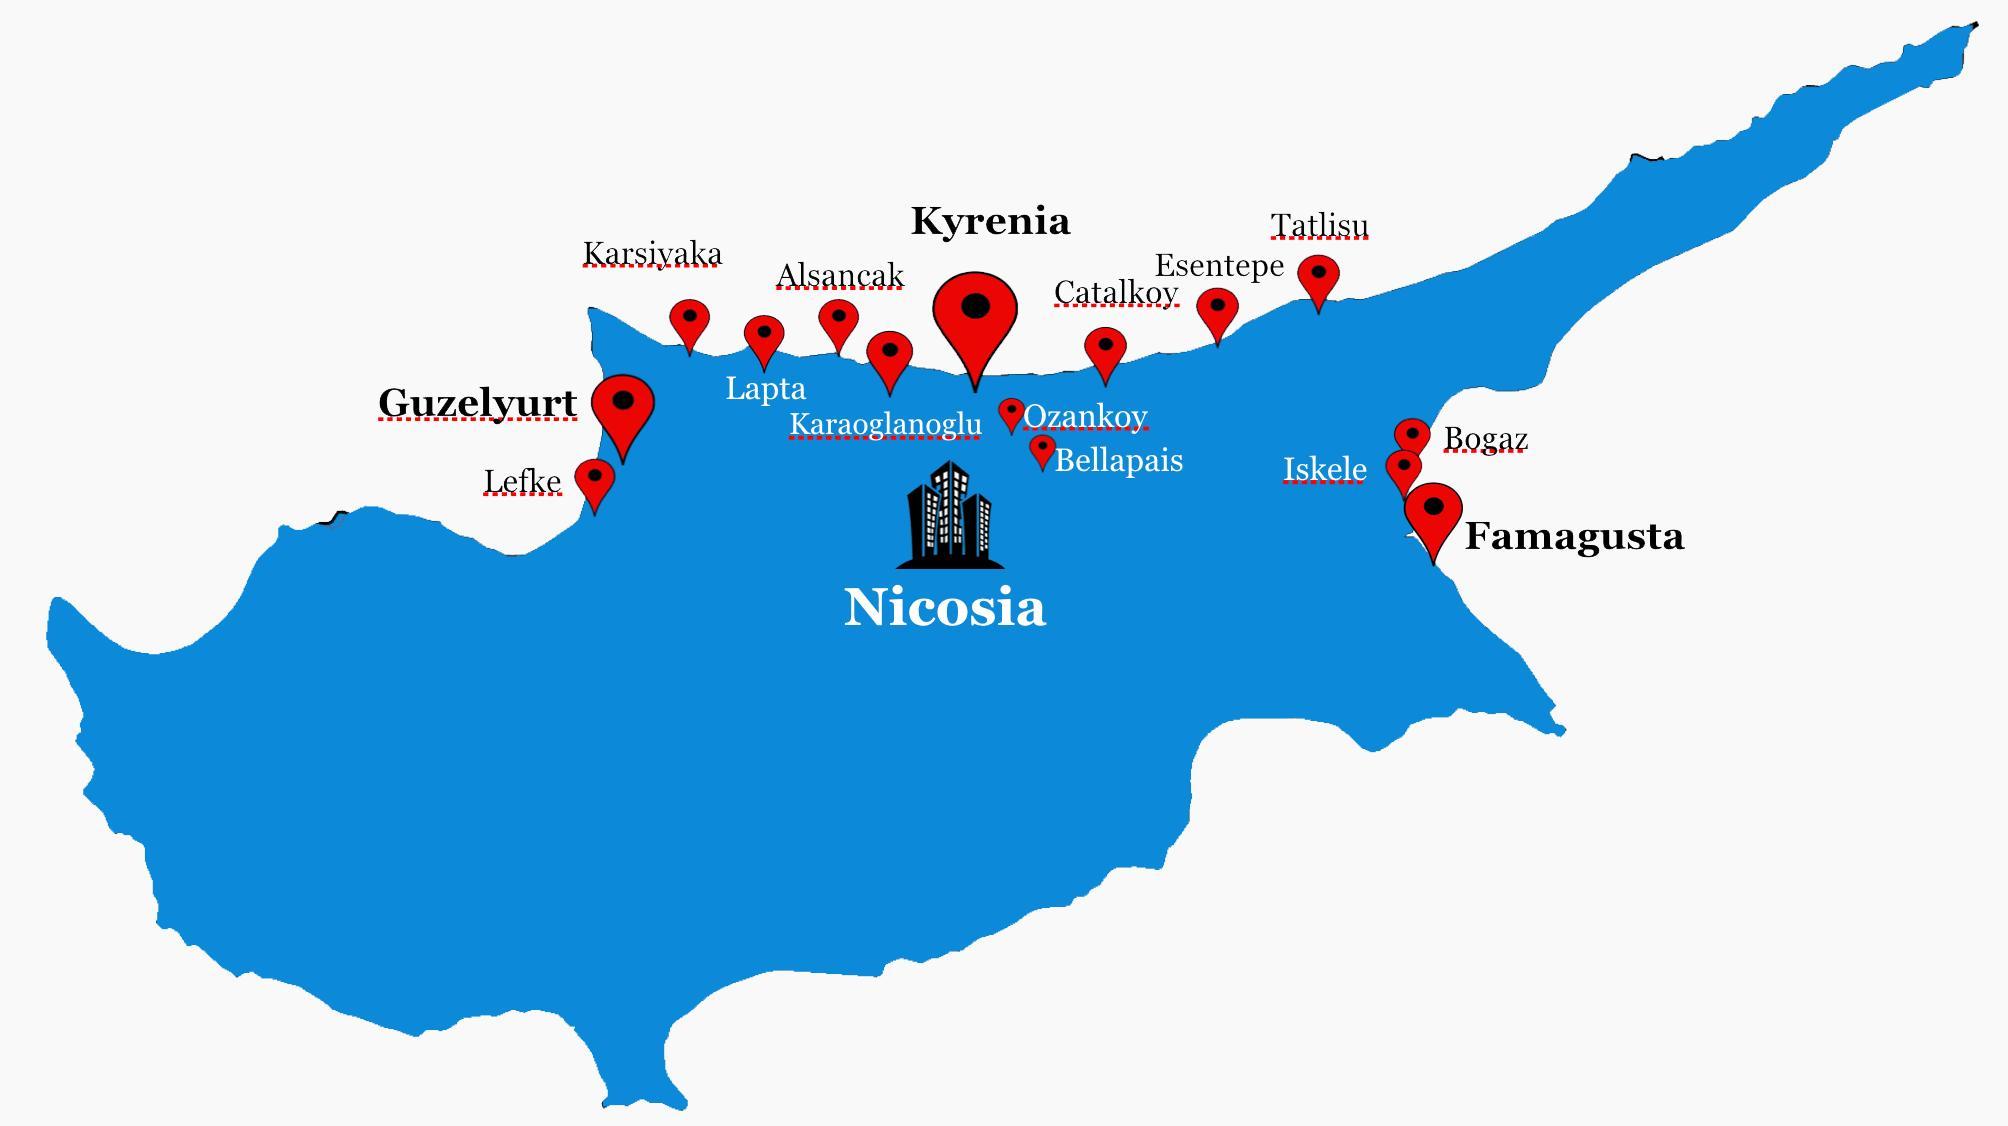 nord kypros kart Nord Kypros kart   Nord Kypros road map (Sør Europa   Europa) nord kypros kart